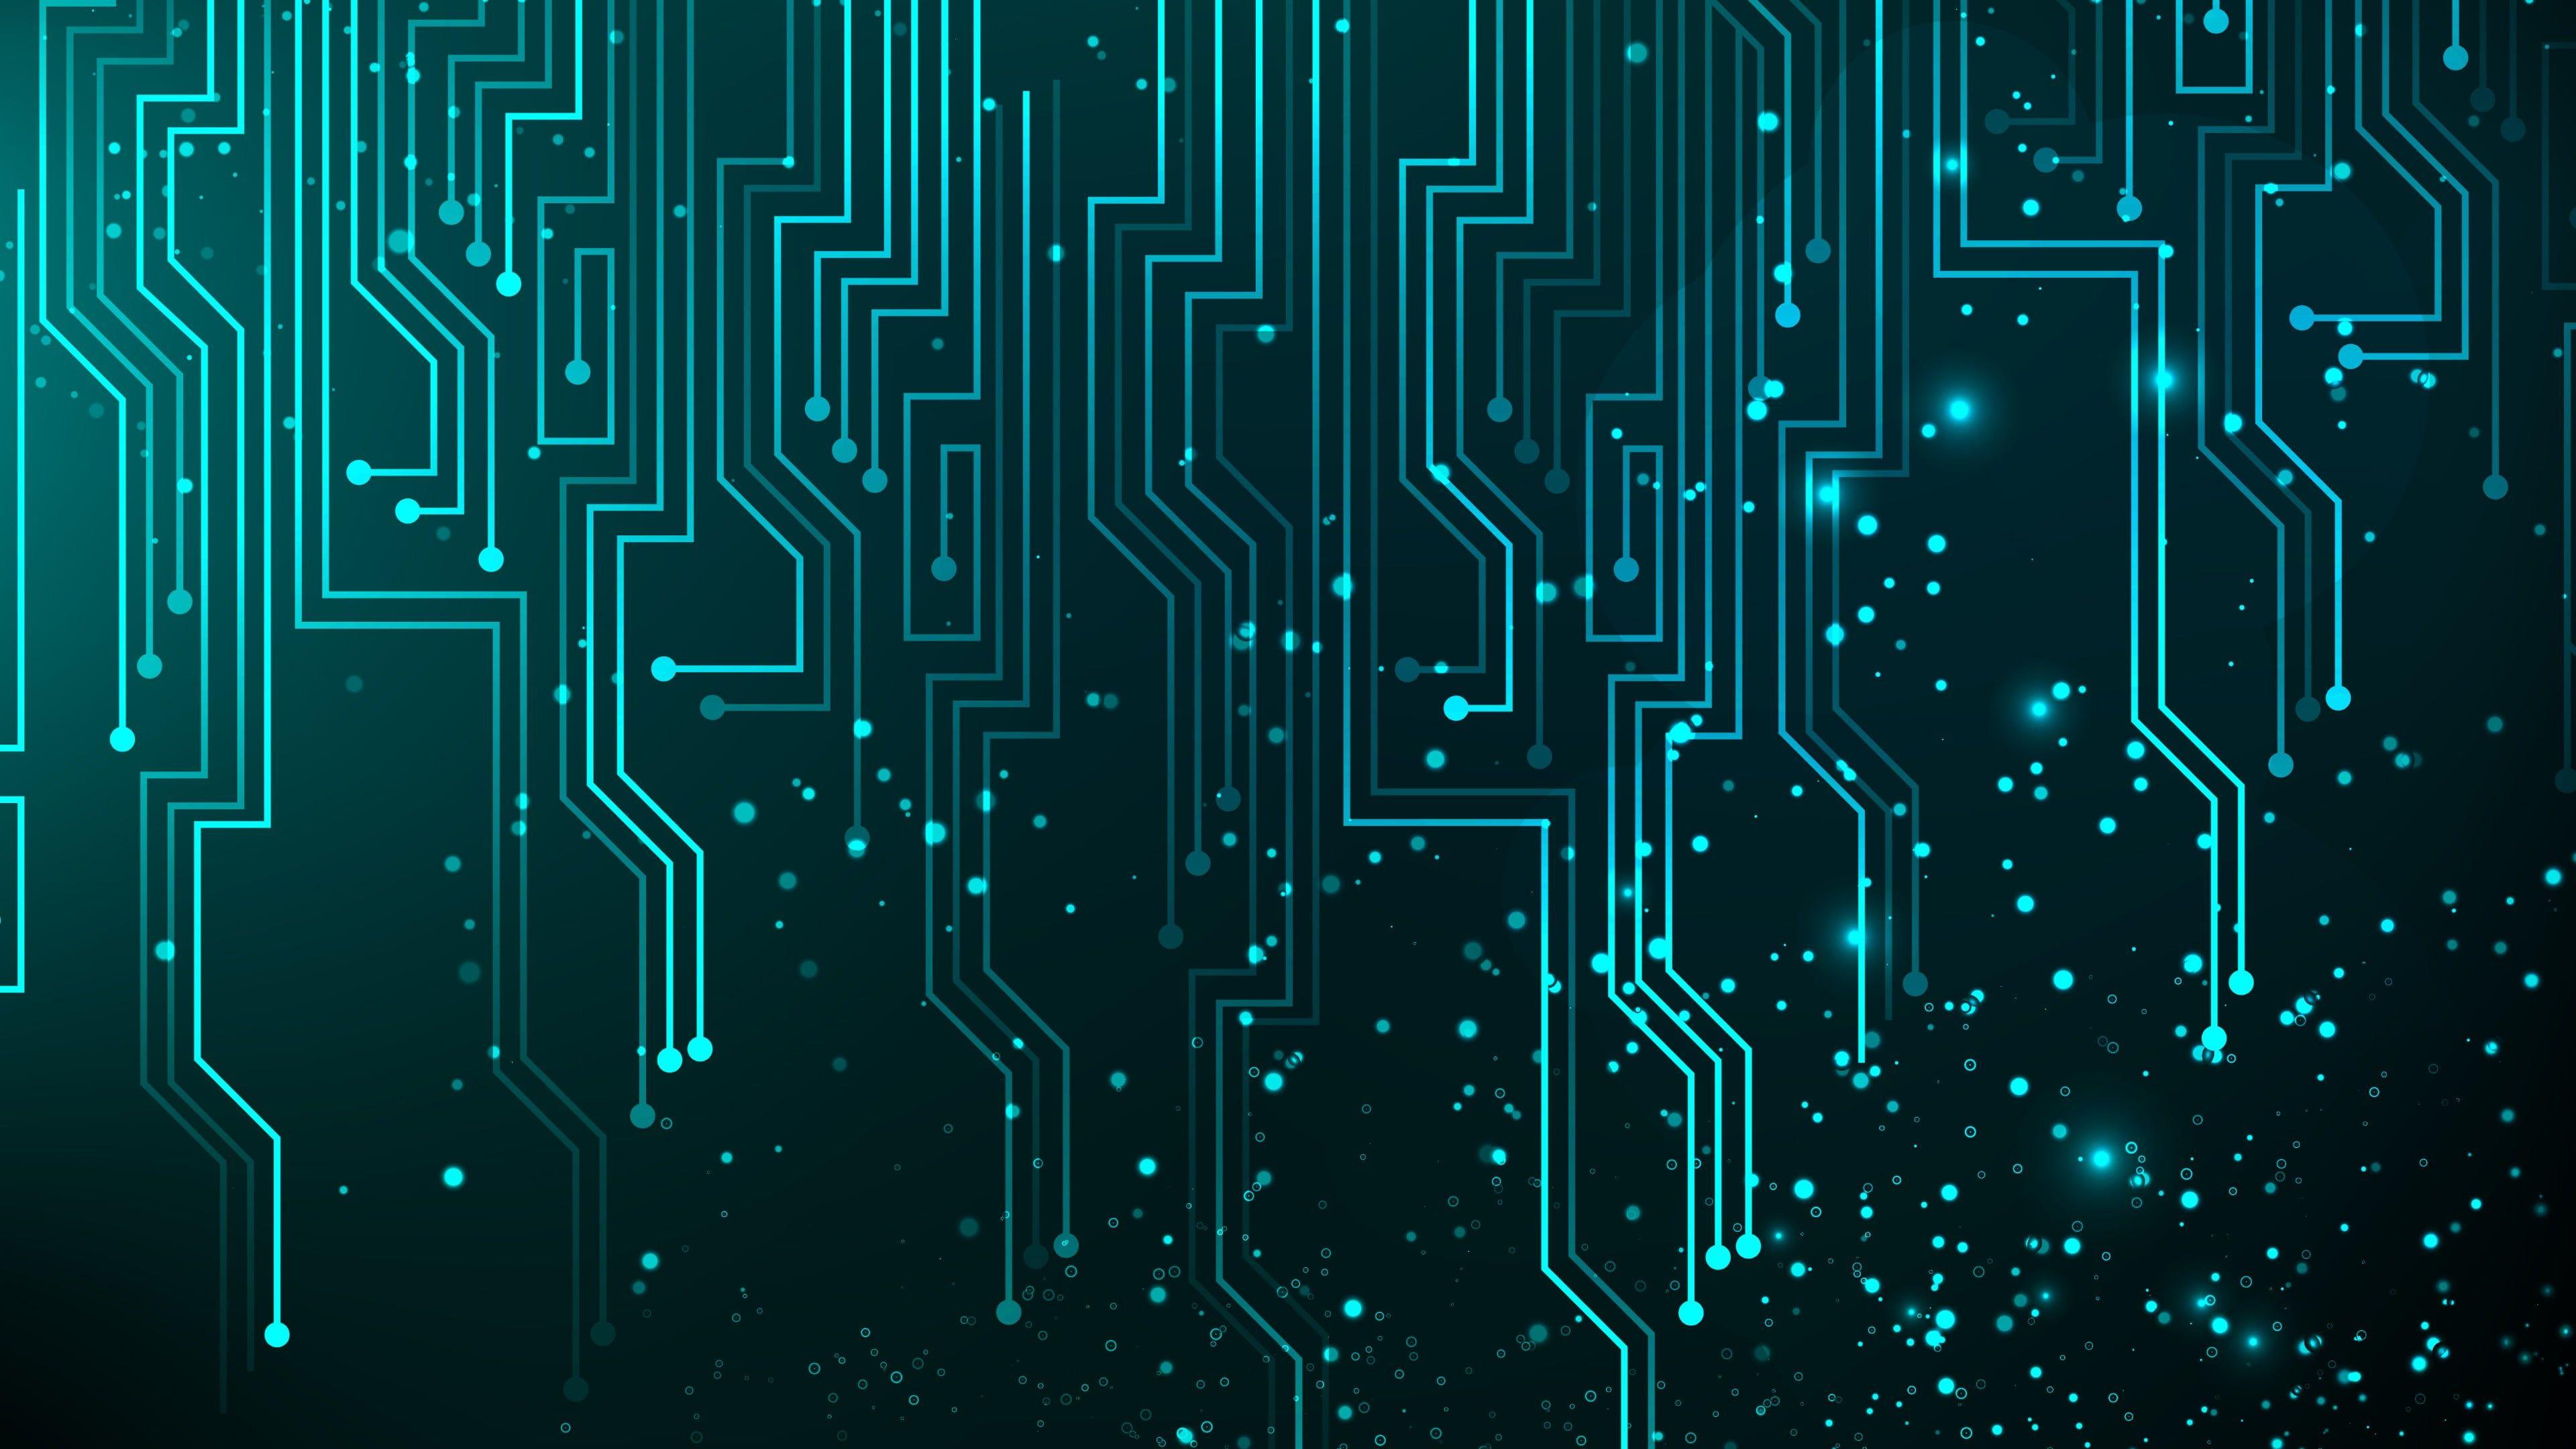 Digital Technology Pattern Sky Line Digital Art Glow Design Abstract Art Visual Effects Gr Electronics Wallpaper Technology Wallpaper Android Wallpaper